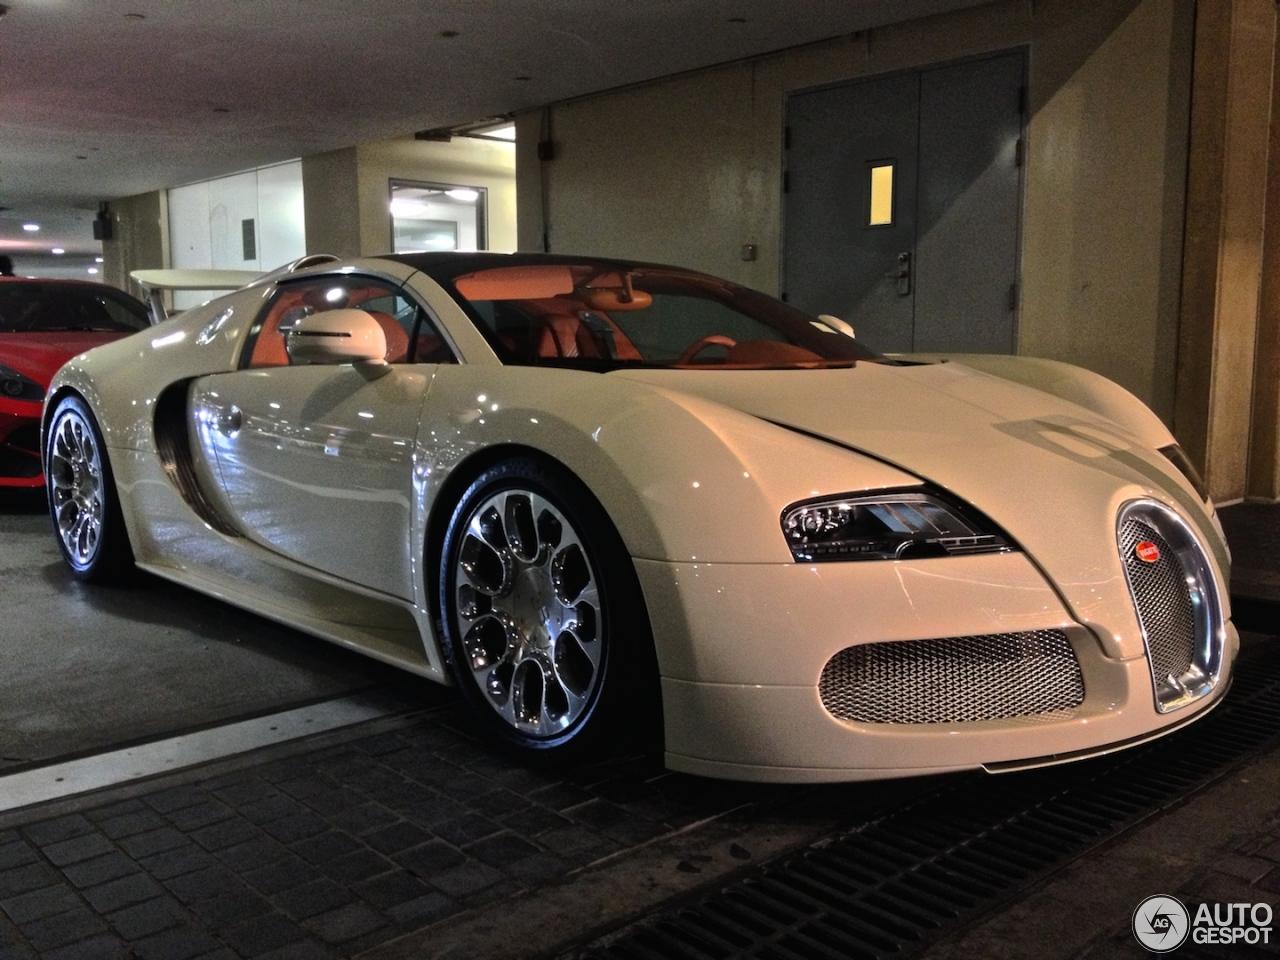 bugatti veyron 16 4 grand sport 13 may 2014 autogespot. Black Bedroom Furniture Sets. Home Design Ideas